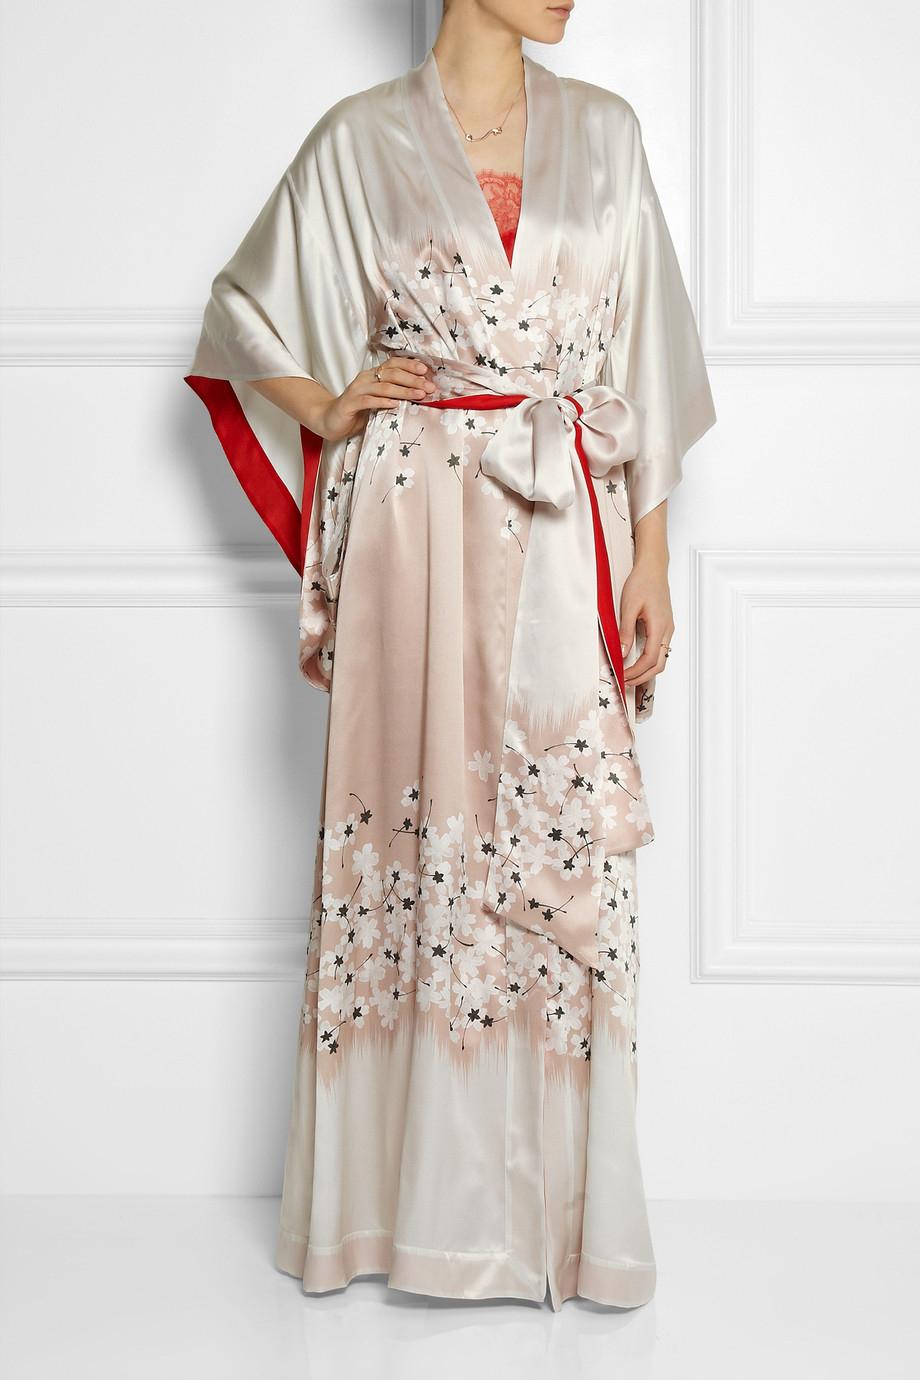 Lyst - Carine Gilson Sakura Floral-print Silk-satin Kimono Robe in ... c27d418cd